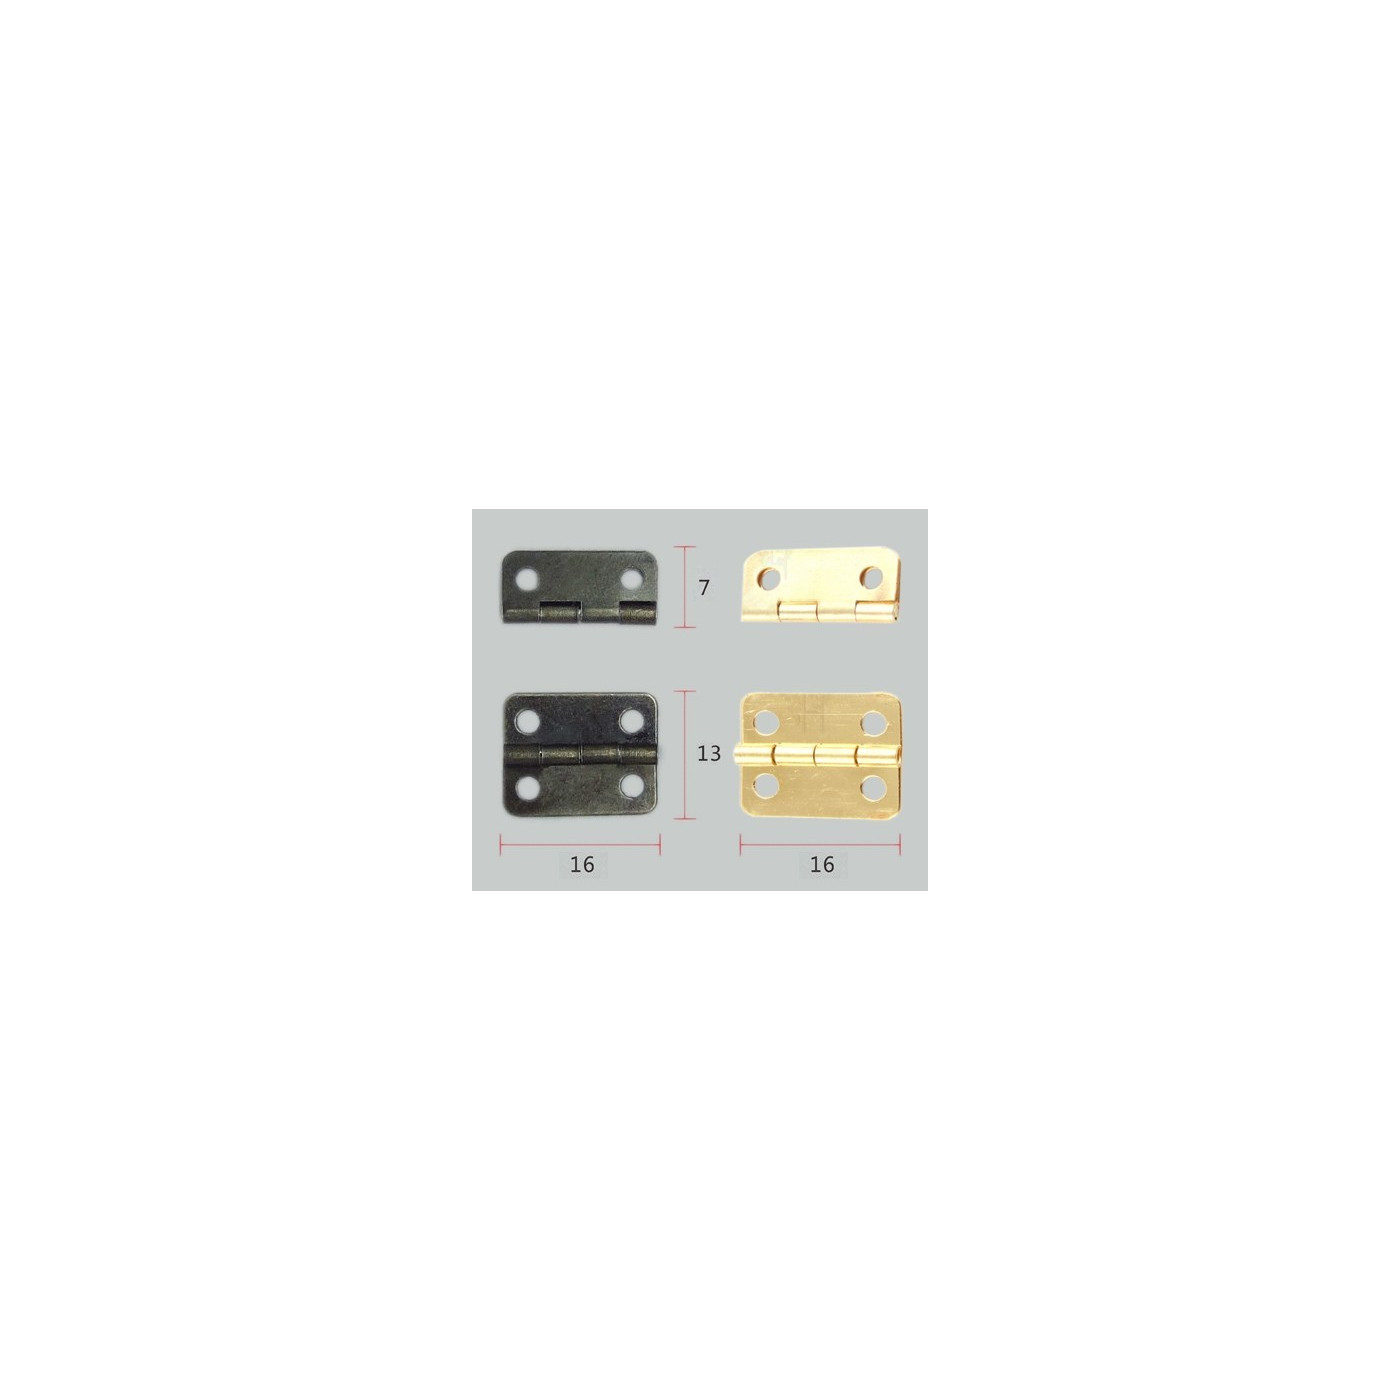 Set van 40 kleine bronzen scharniertjes, 16x13 mm